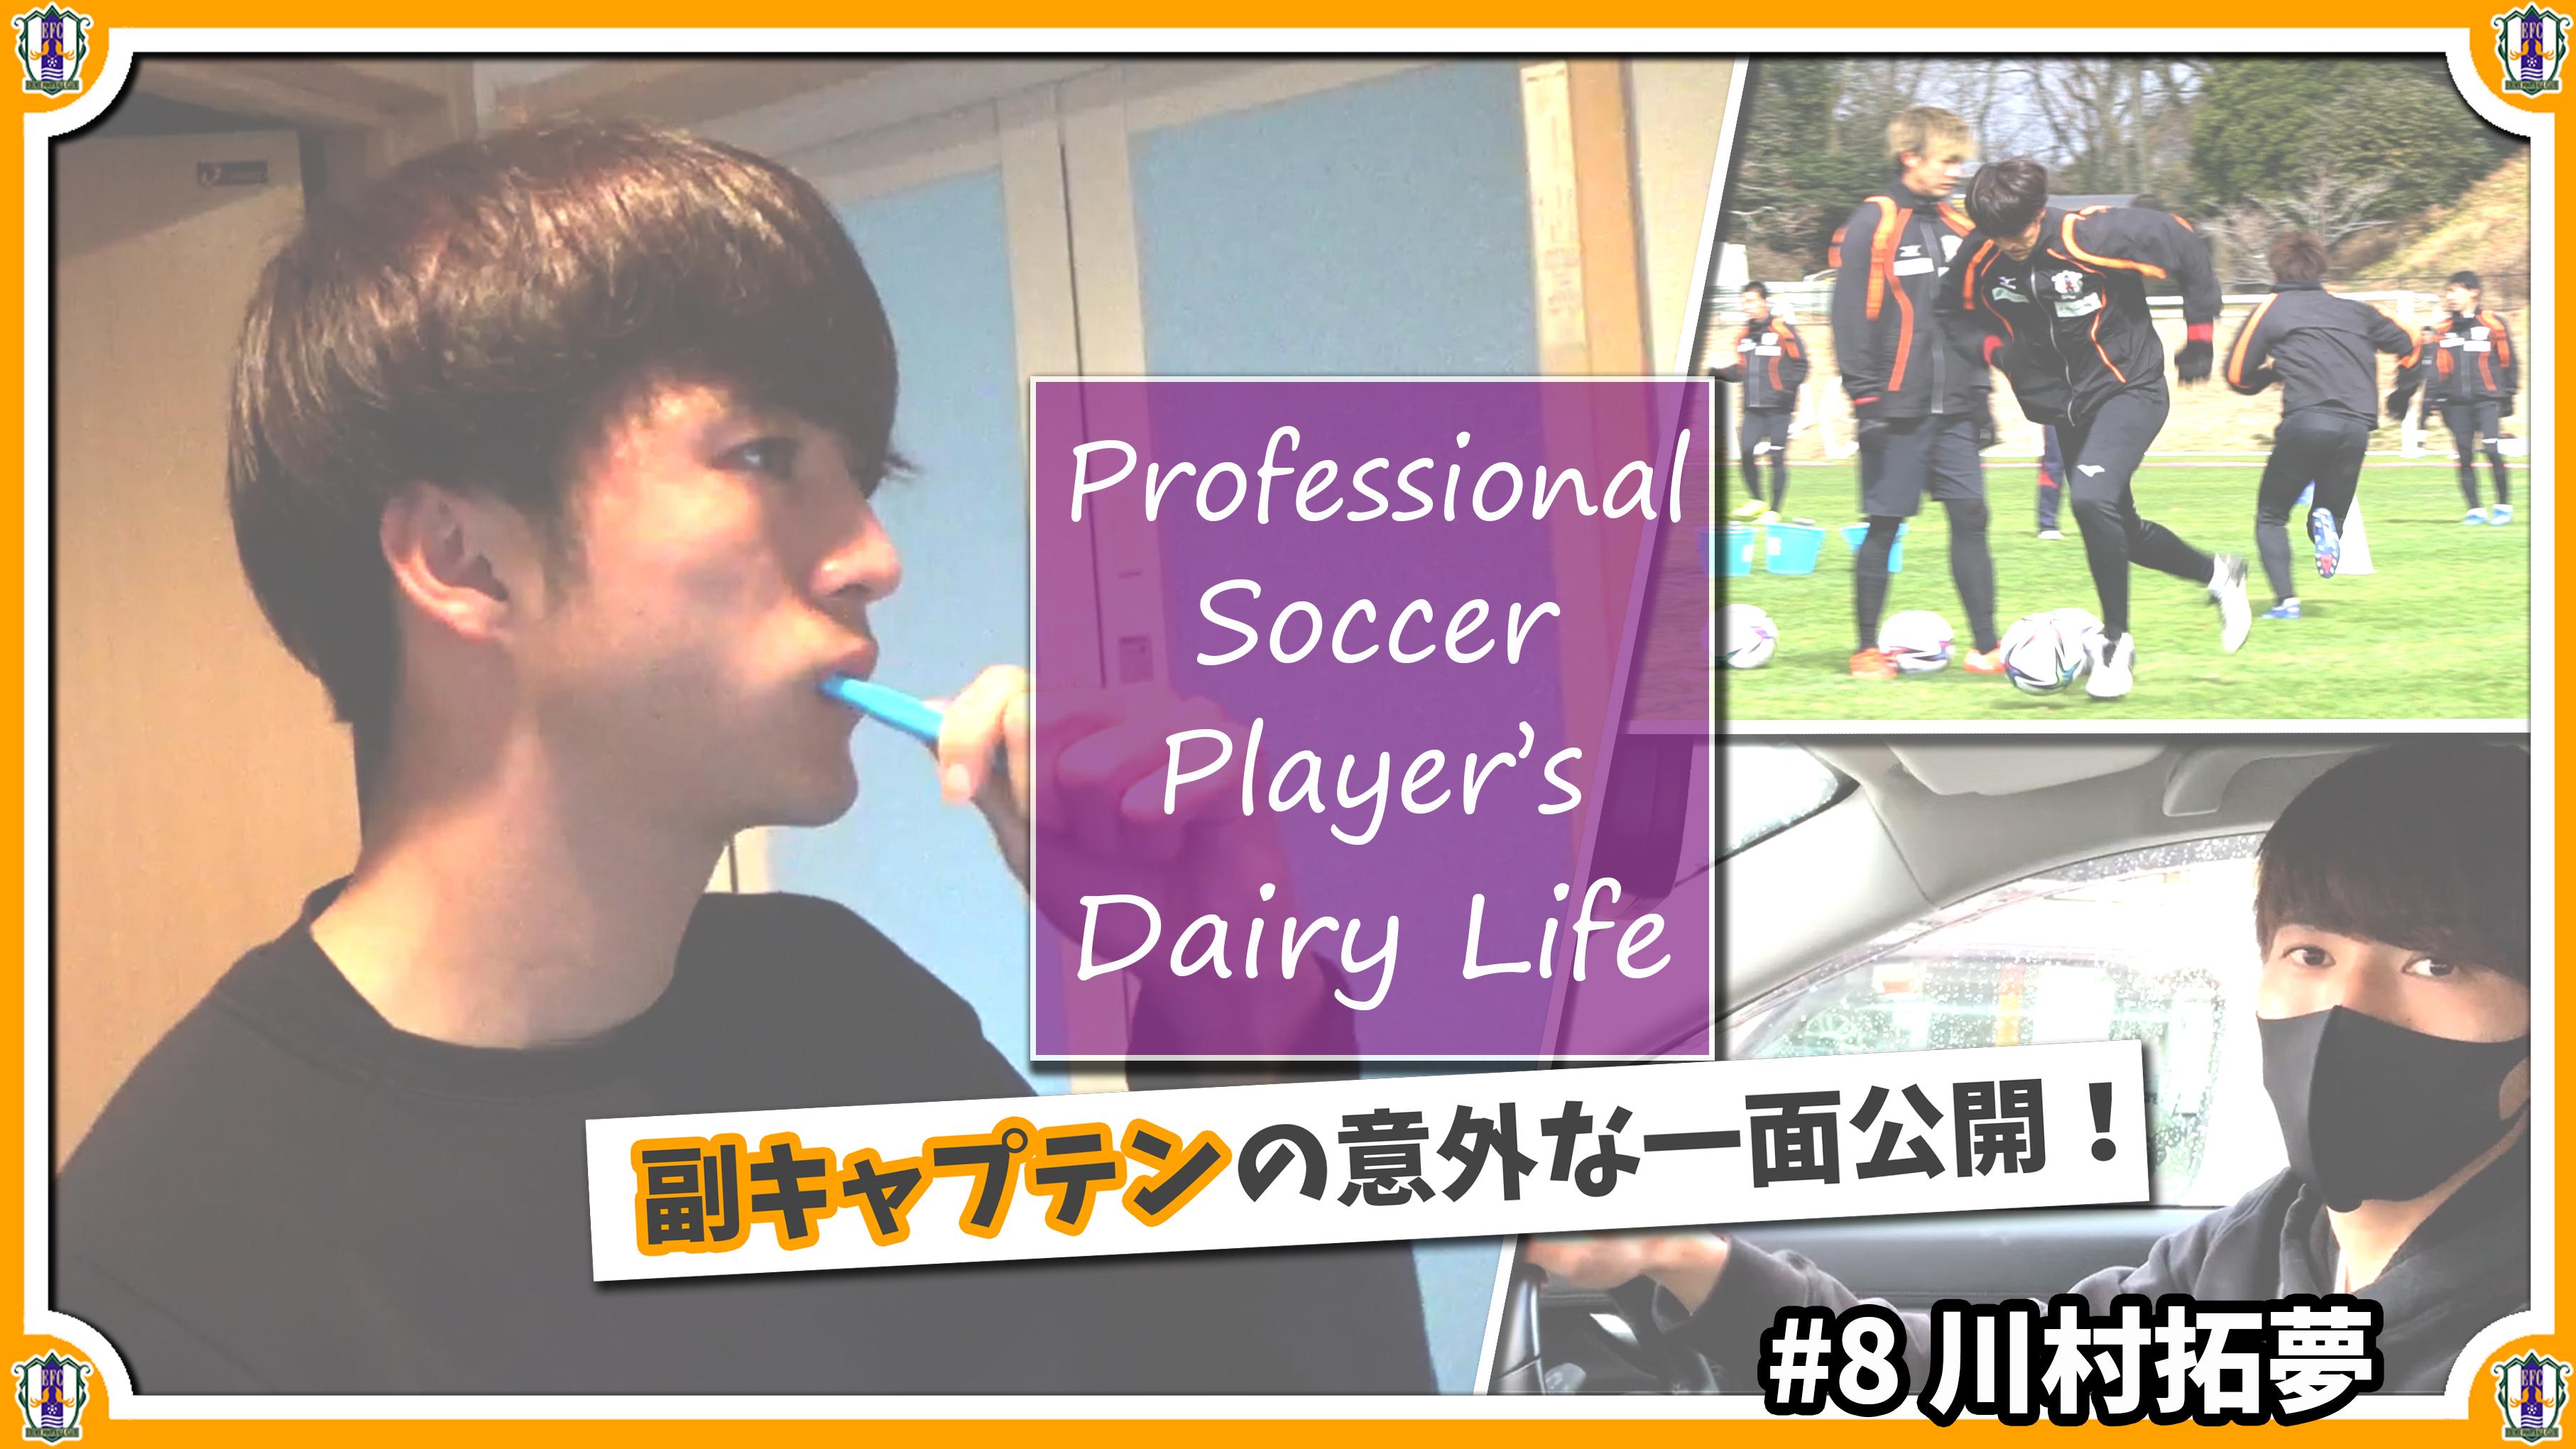 【Vlog】独り身イケメン川村拓夢~Professional Soccer Player's Dairy Life ~ 明治安田生命Jリーグ開幕!